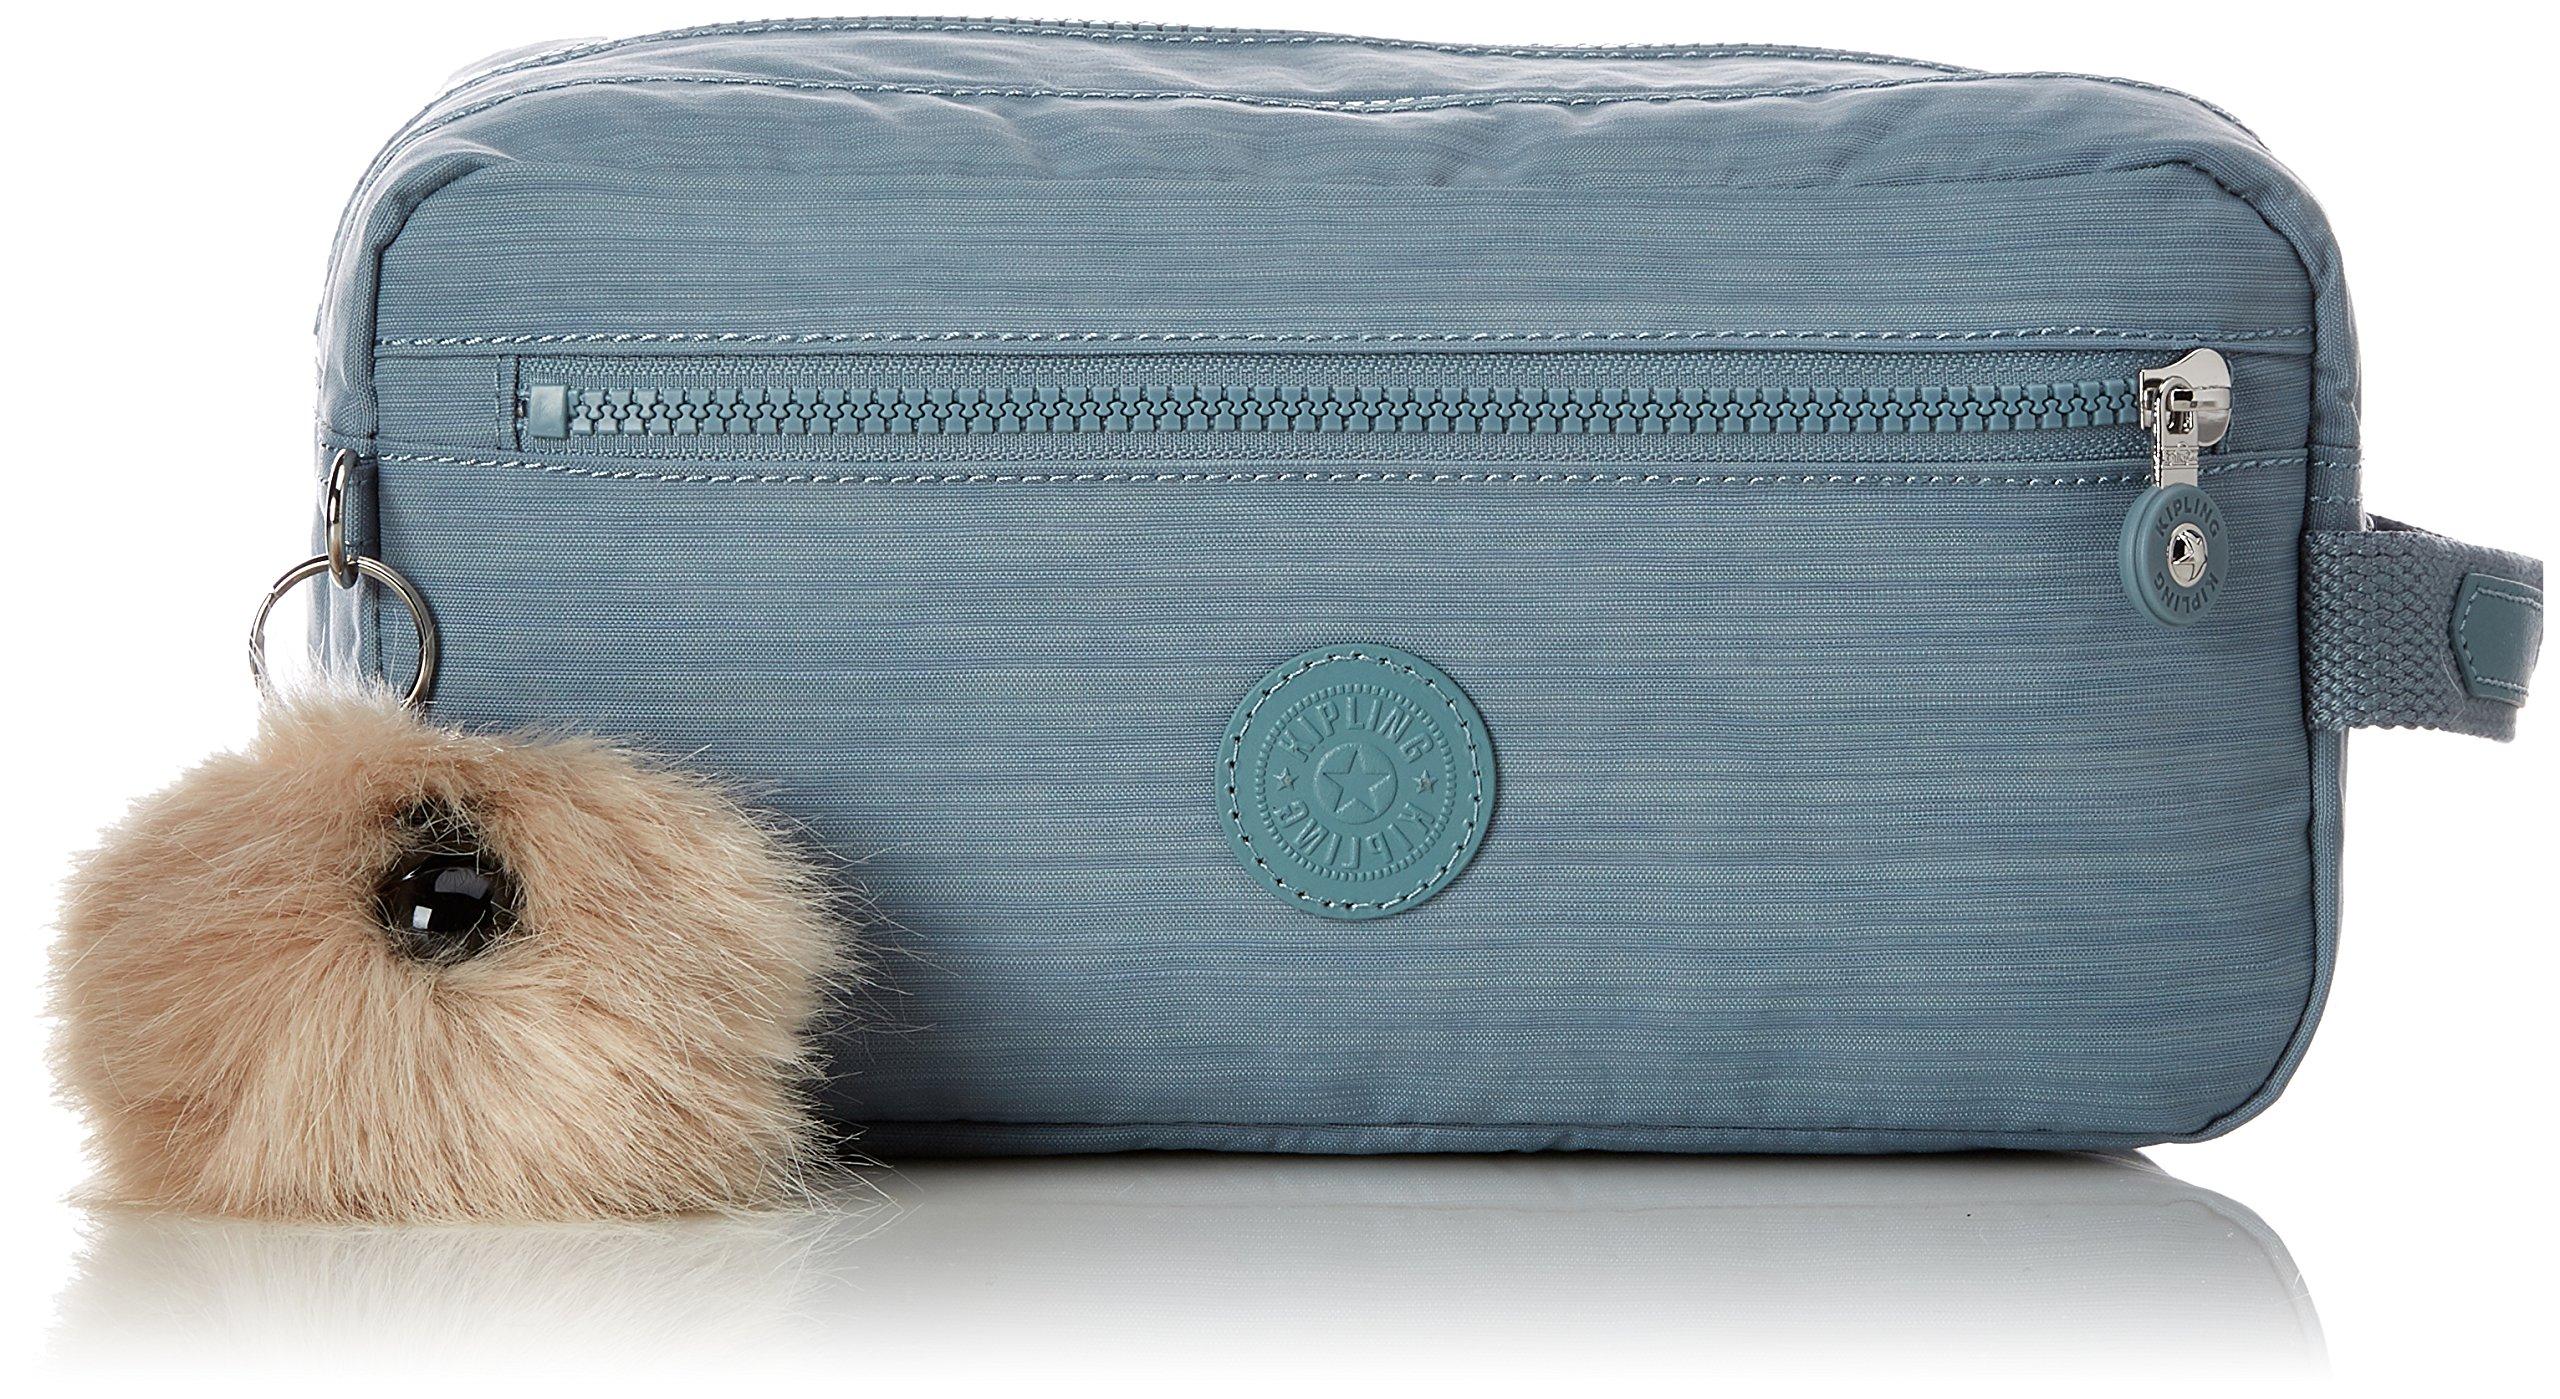 colours and striking favorable price wide range Kipling AGOT Toiletry Bag, 26 cm, 3 liters, Blue (Dazz Soft Aloe)